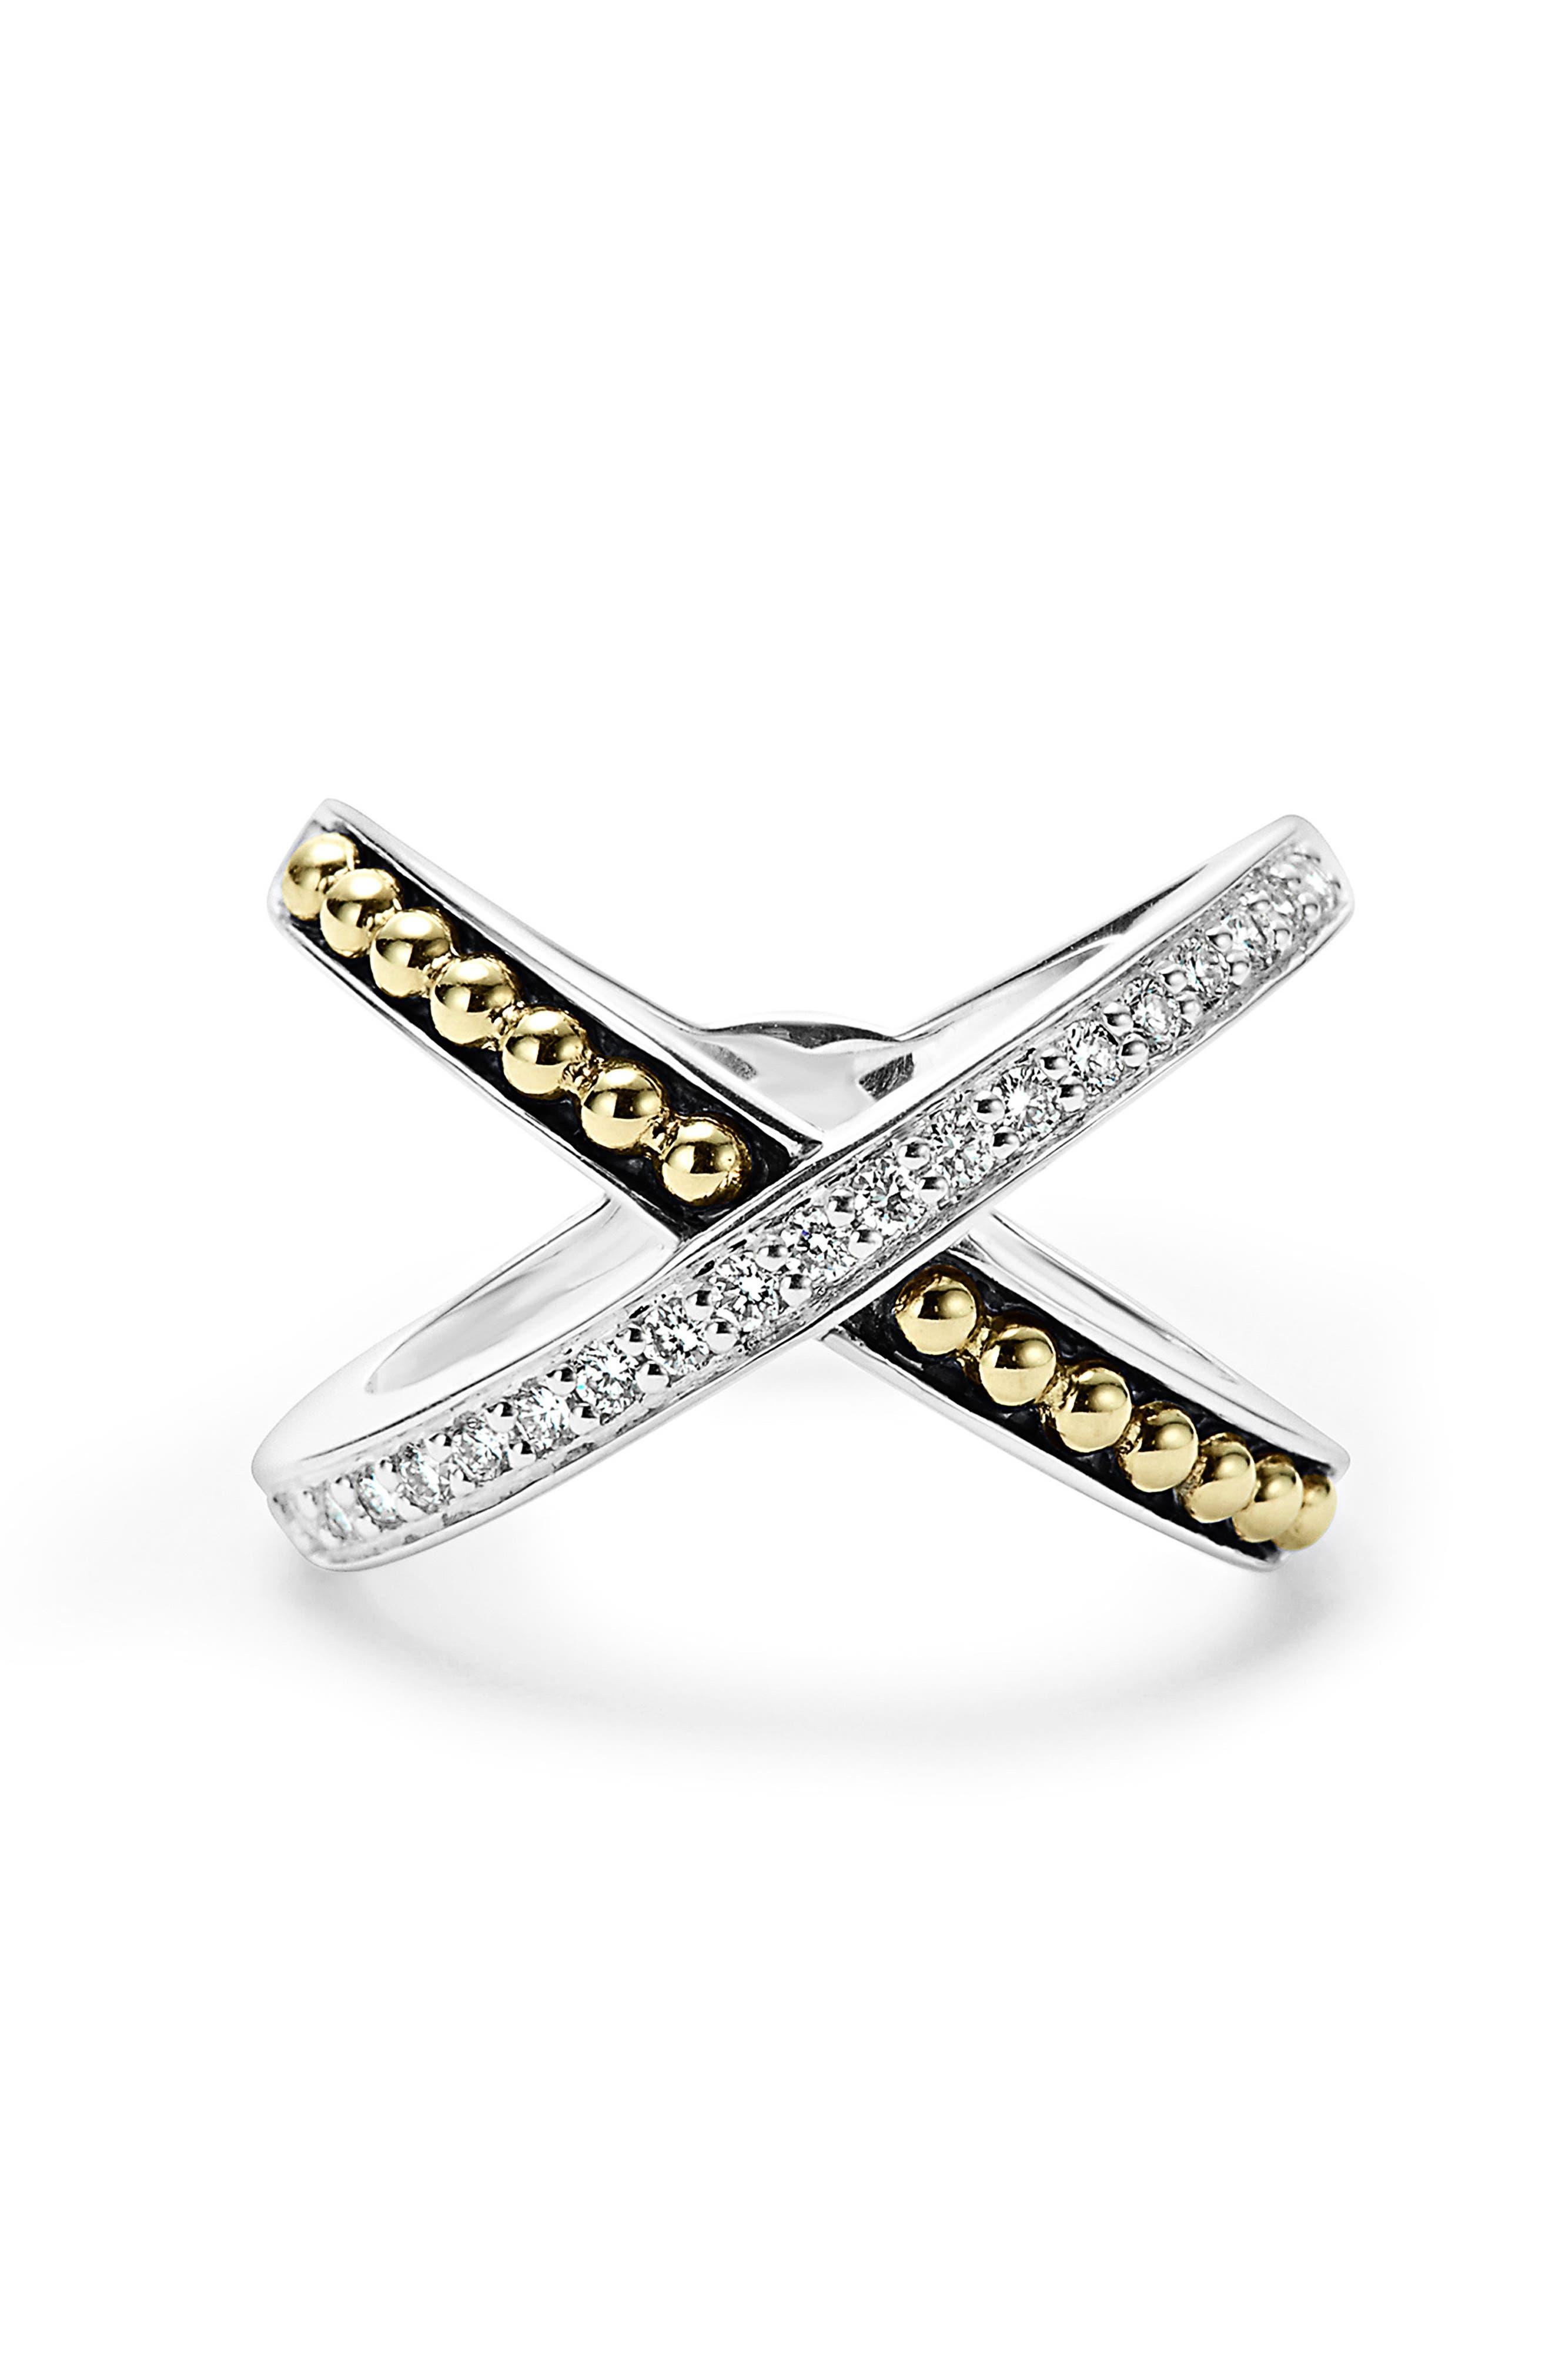 KSL Diamond Pavé Crossover Ring,                             Alternate thumbnail 3, color,                             SILVER/ GOLD/ DIAMOND